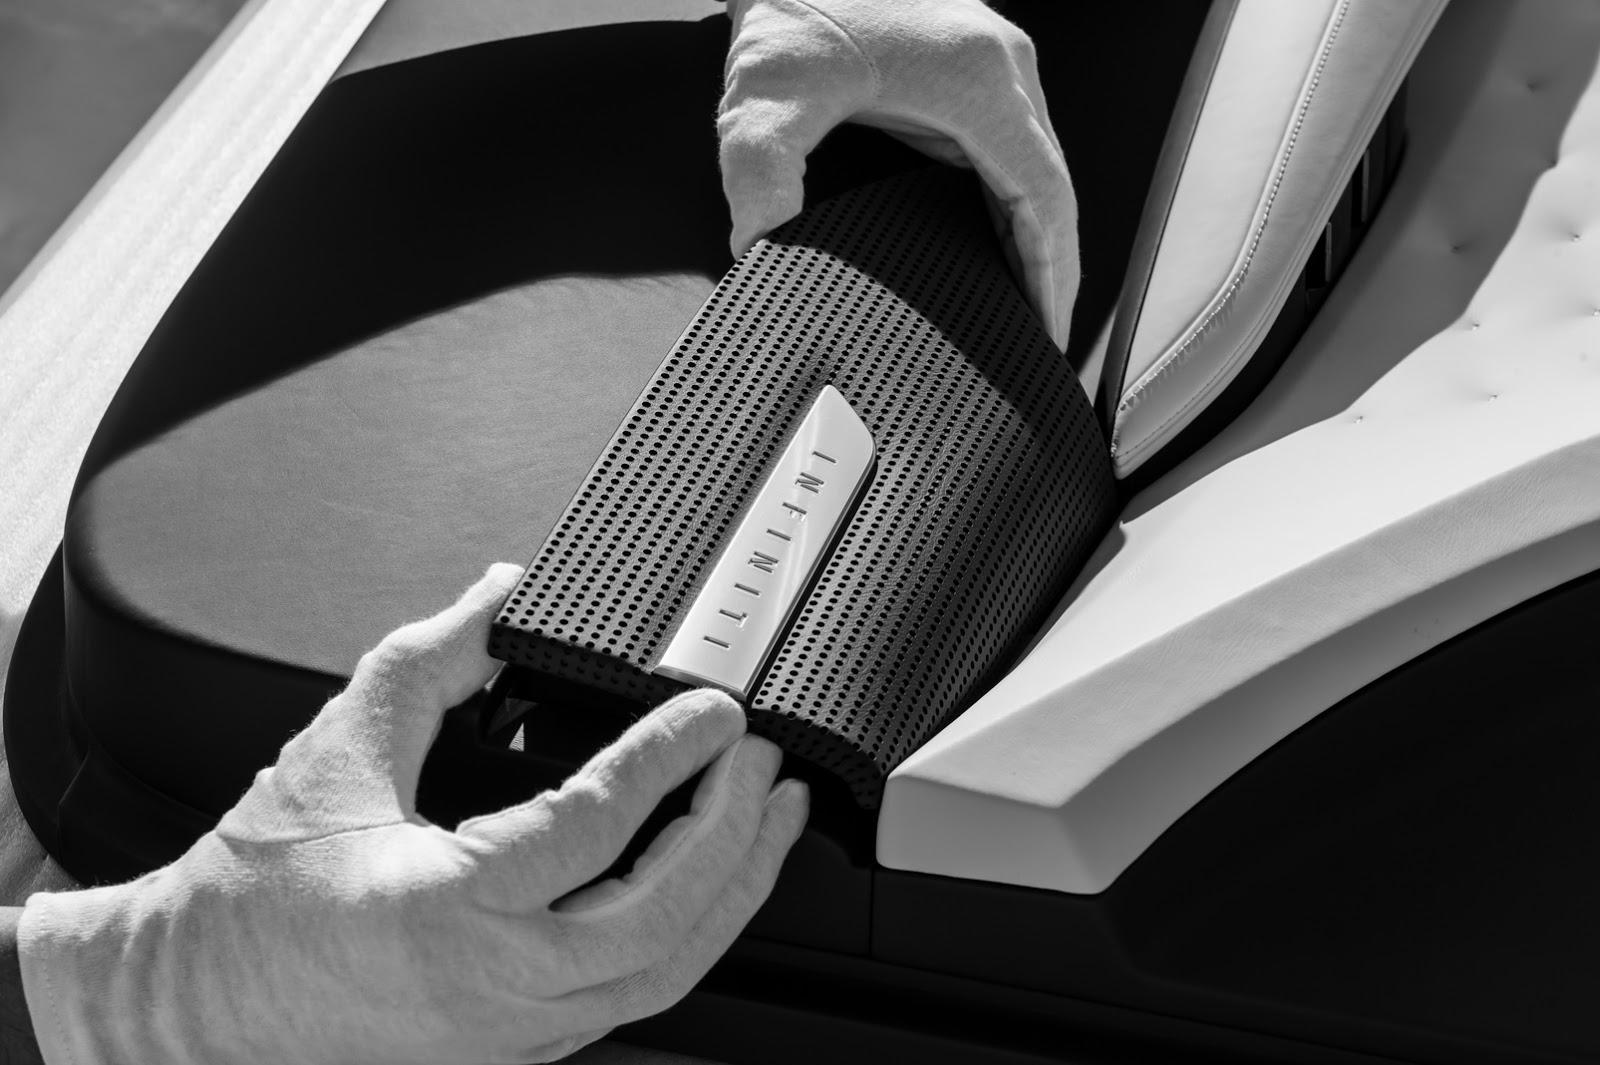 إنفينيتي تعلن عن QX50 كونسيبت بمعرض ديترويت Infinity Infiniti-qx50-concept-arrives-detroit-27